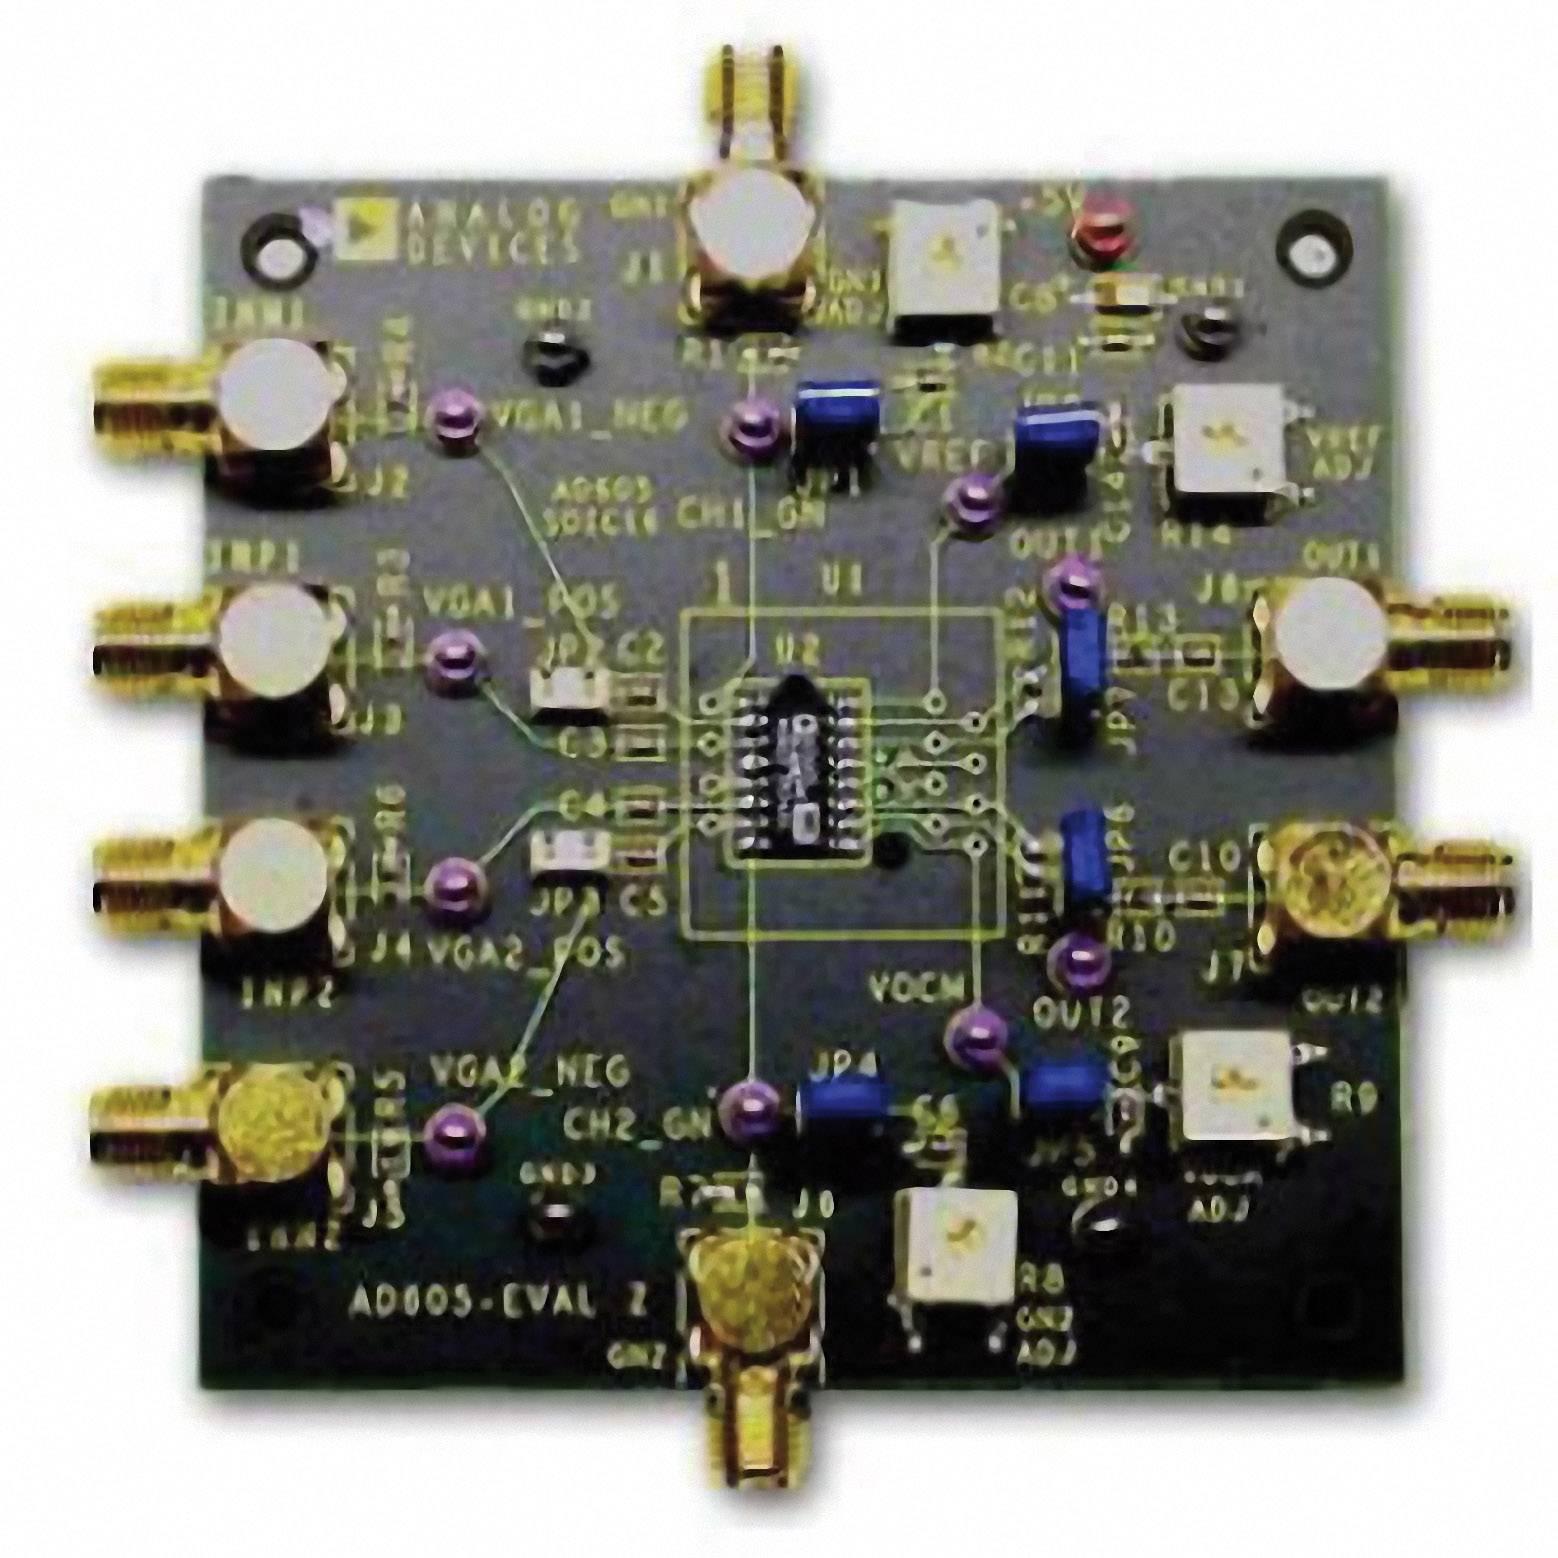 Vývojová deska Analog Devices AD605-EVALZ